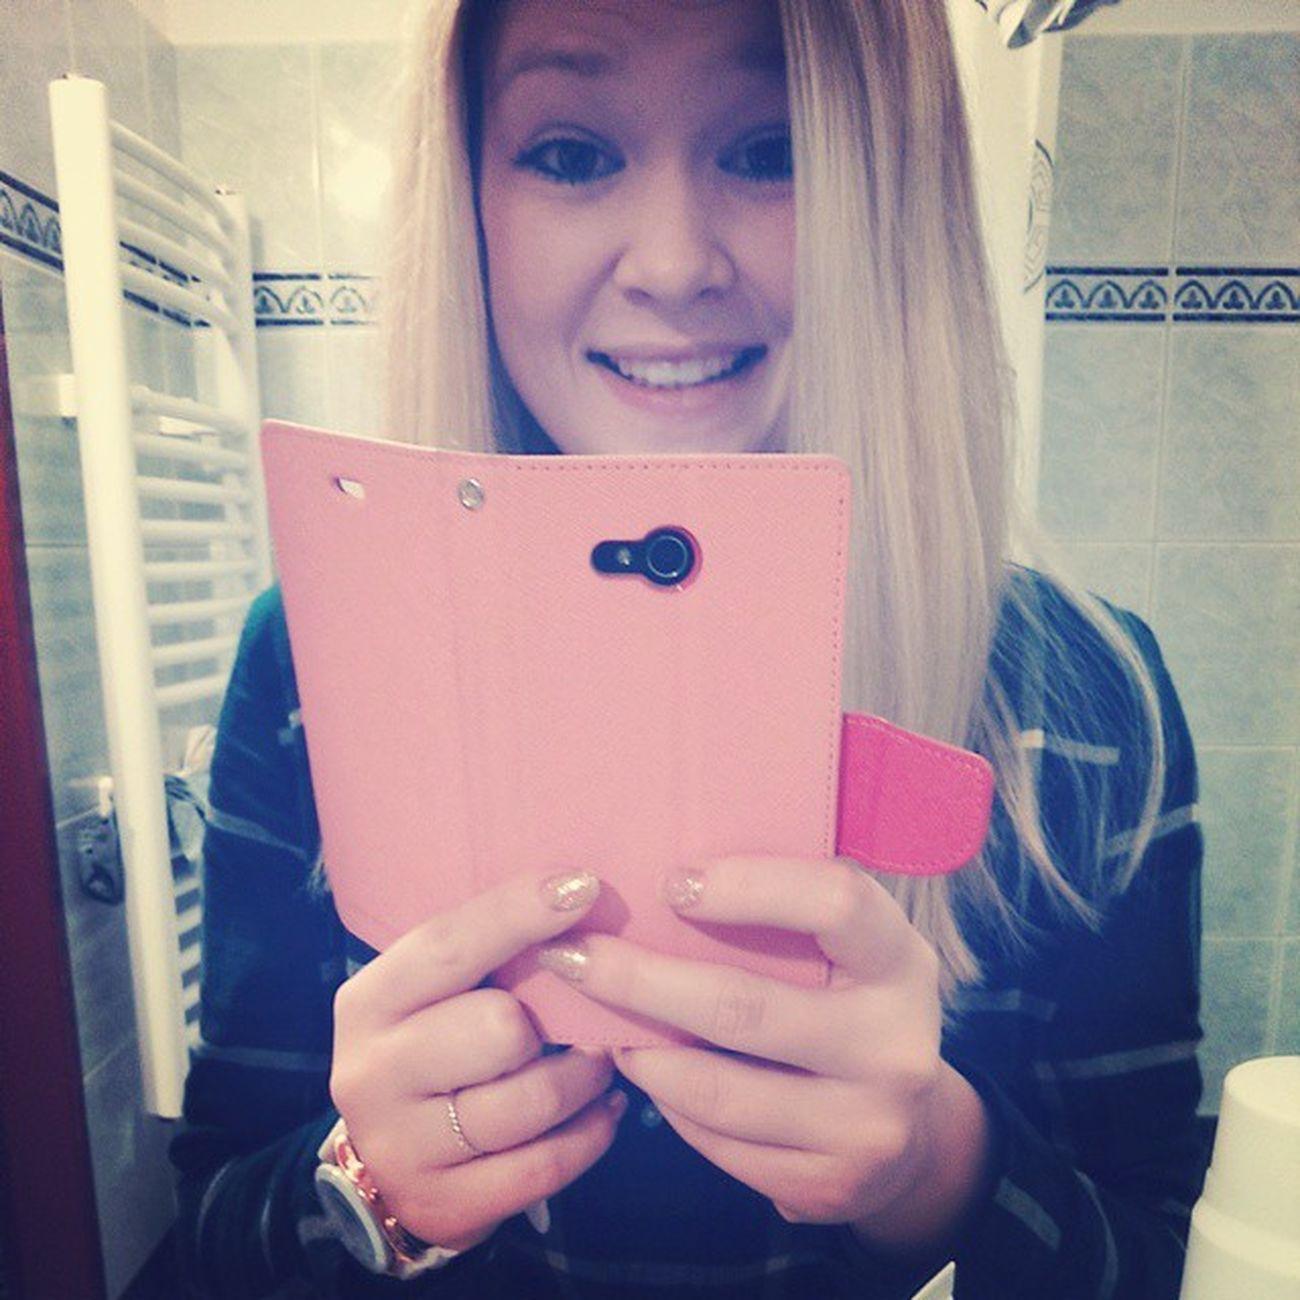 ?? Blonde Girl Smile Happy laughtteethlipseyesstylemobilephonebathroomfollowmetagsforlikesphotoofthedayfashionhairlovecoolfacewomanCzechfunnycrazyunicornmamseprosteskveleinloveangel